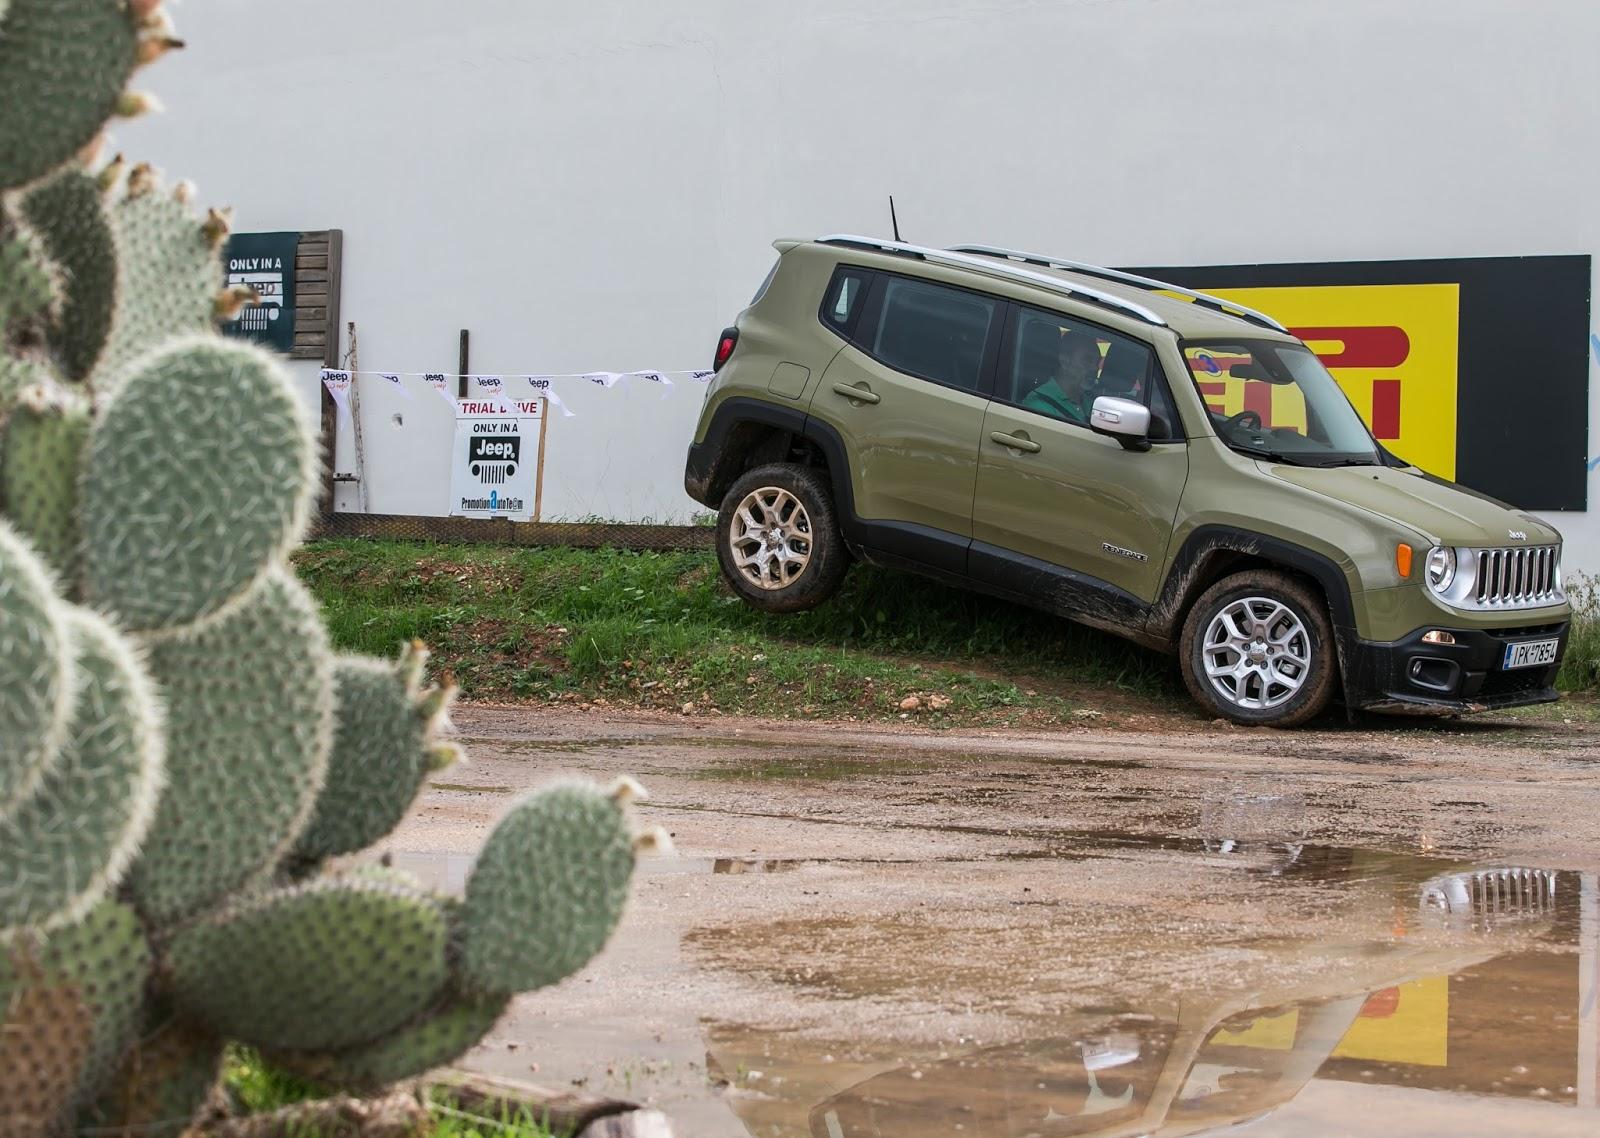 KF 1606 Πετάμε ένα Jeep Renegade σε λάσπες, πέτρες, άμμο, λίμνες. Θα τα καταφέρει; Jeep, Jeep Renegade, Renegade, SUV, TEST, zblog, ΔΟΚΙΜΕΣ